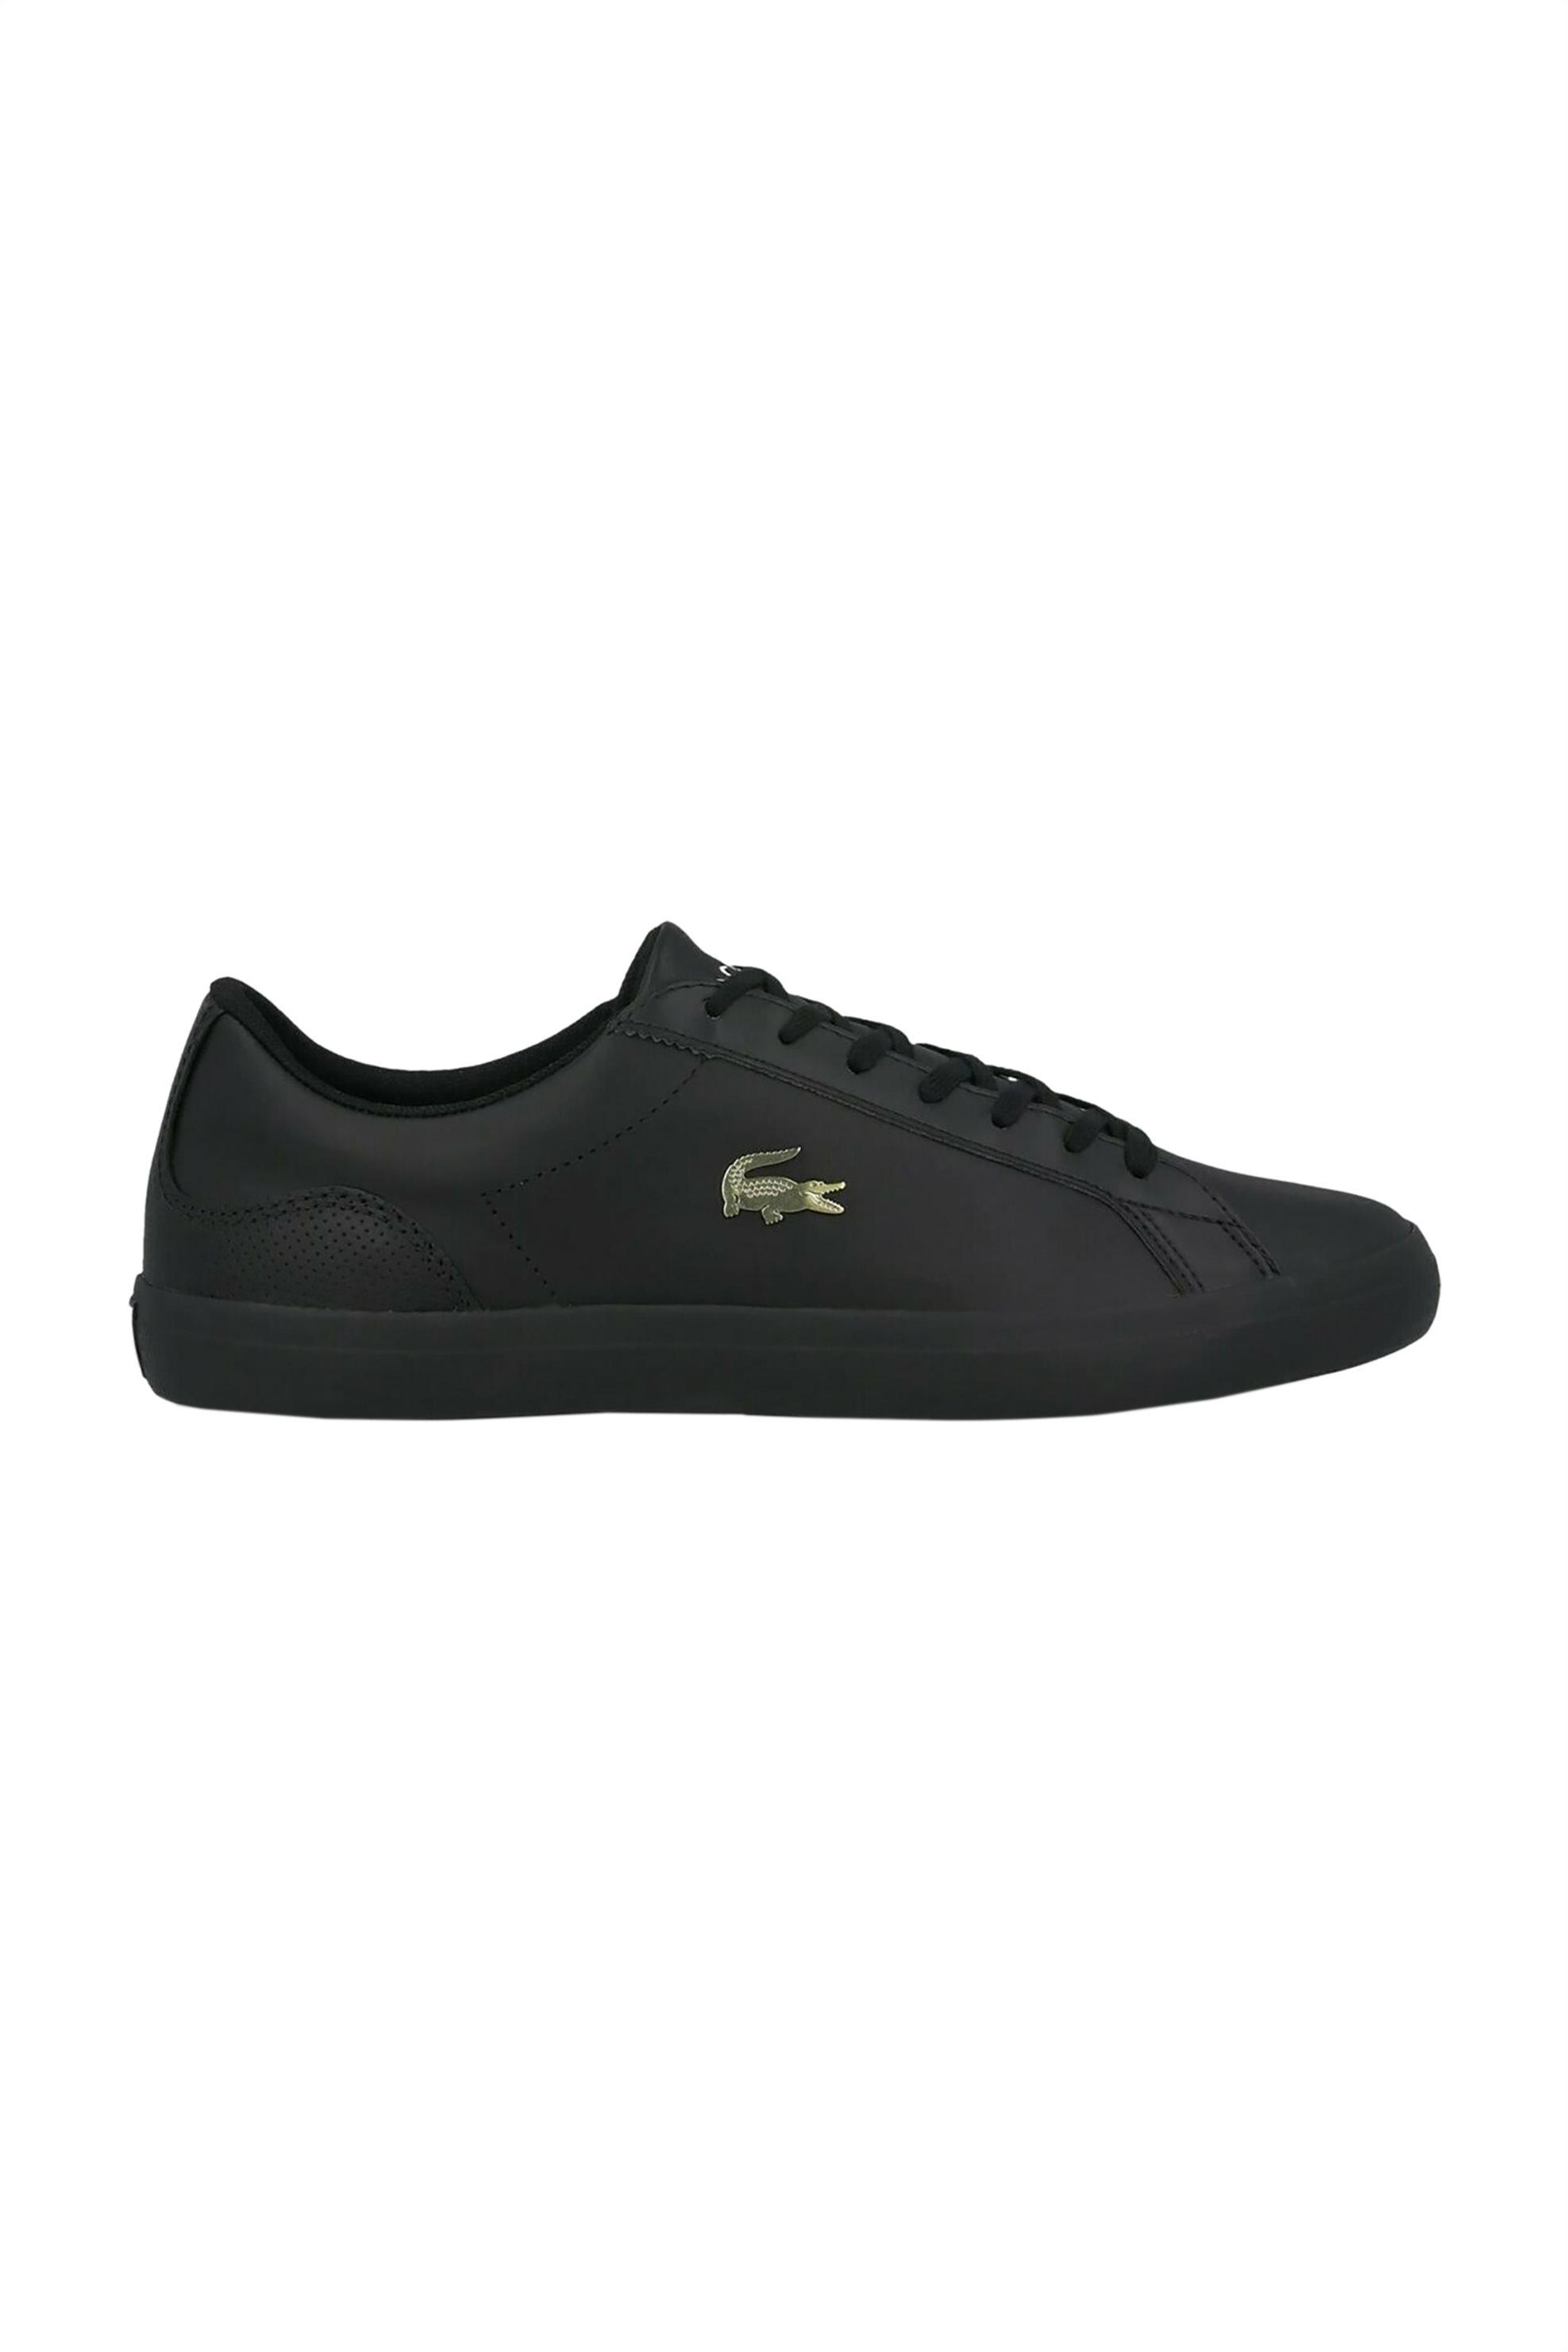 "Lacoste ανδρικα sneakers με χρυσό λογότυπο ""Lerond 0120 2"" – 40CMA005602H – Μαύρο"